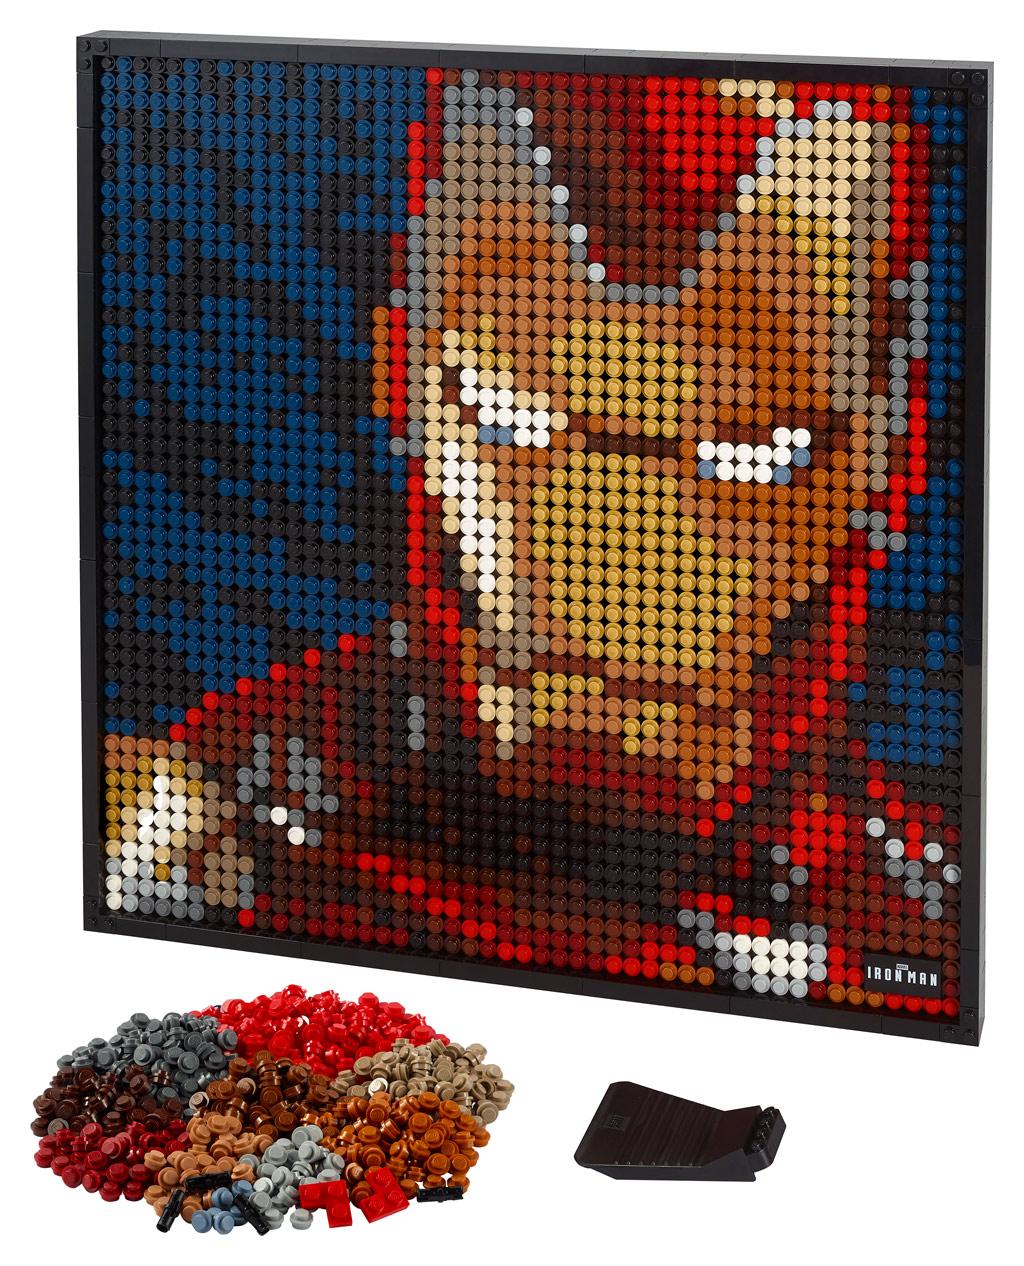 lego-arts-31199-marvel-studios-iron-man-inhalt-2020 zusammengebaut.com